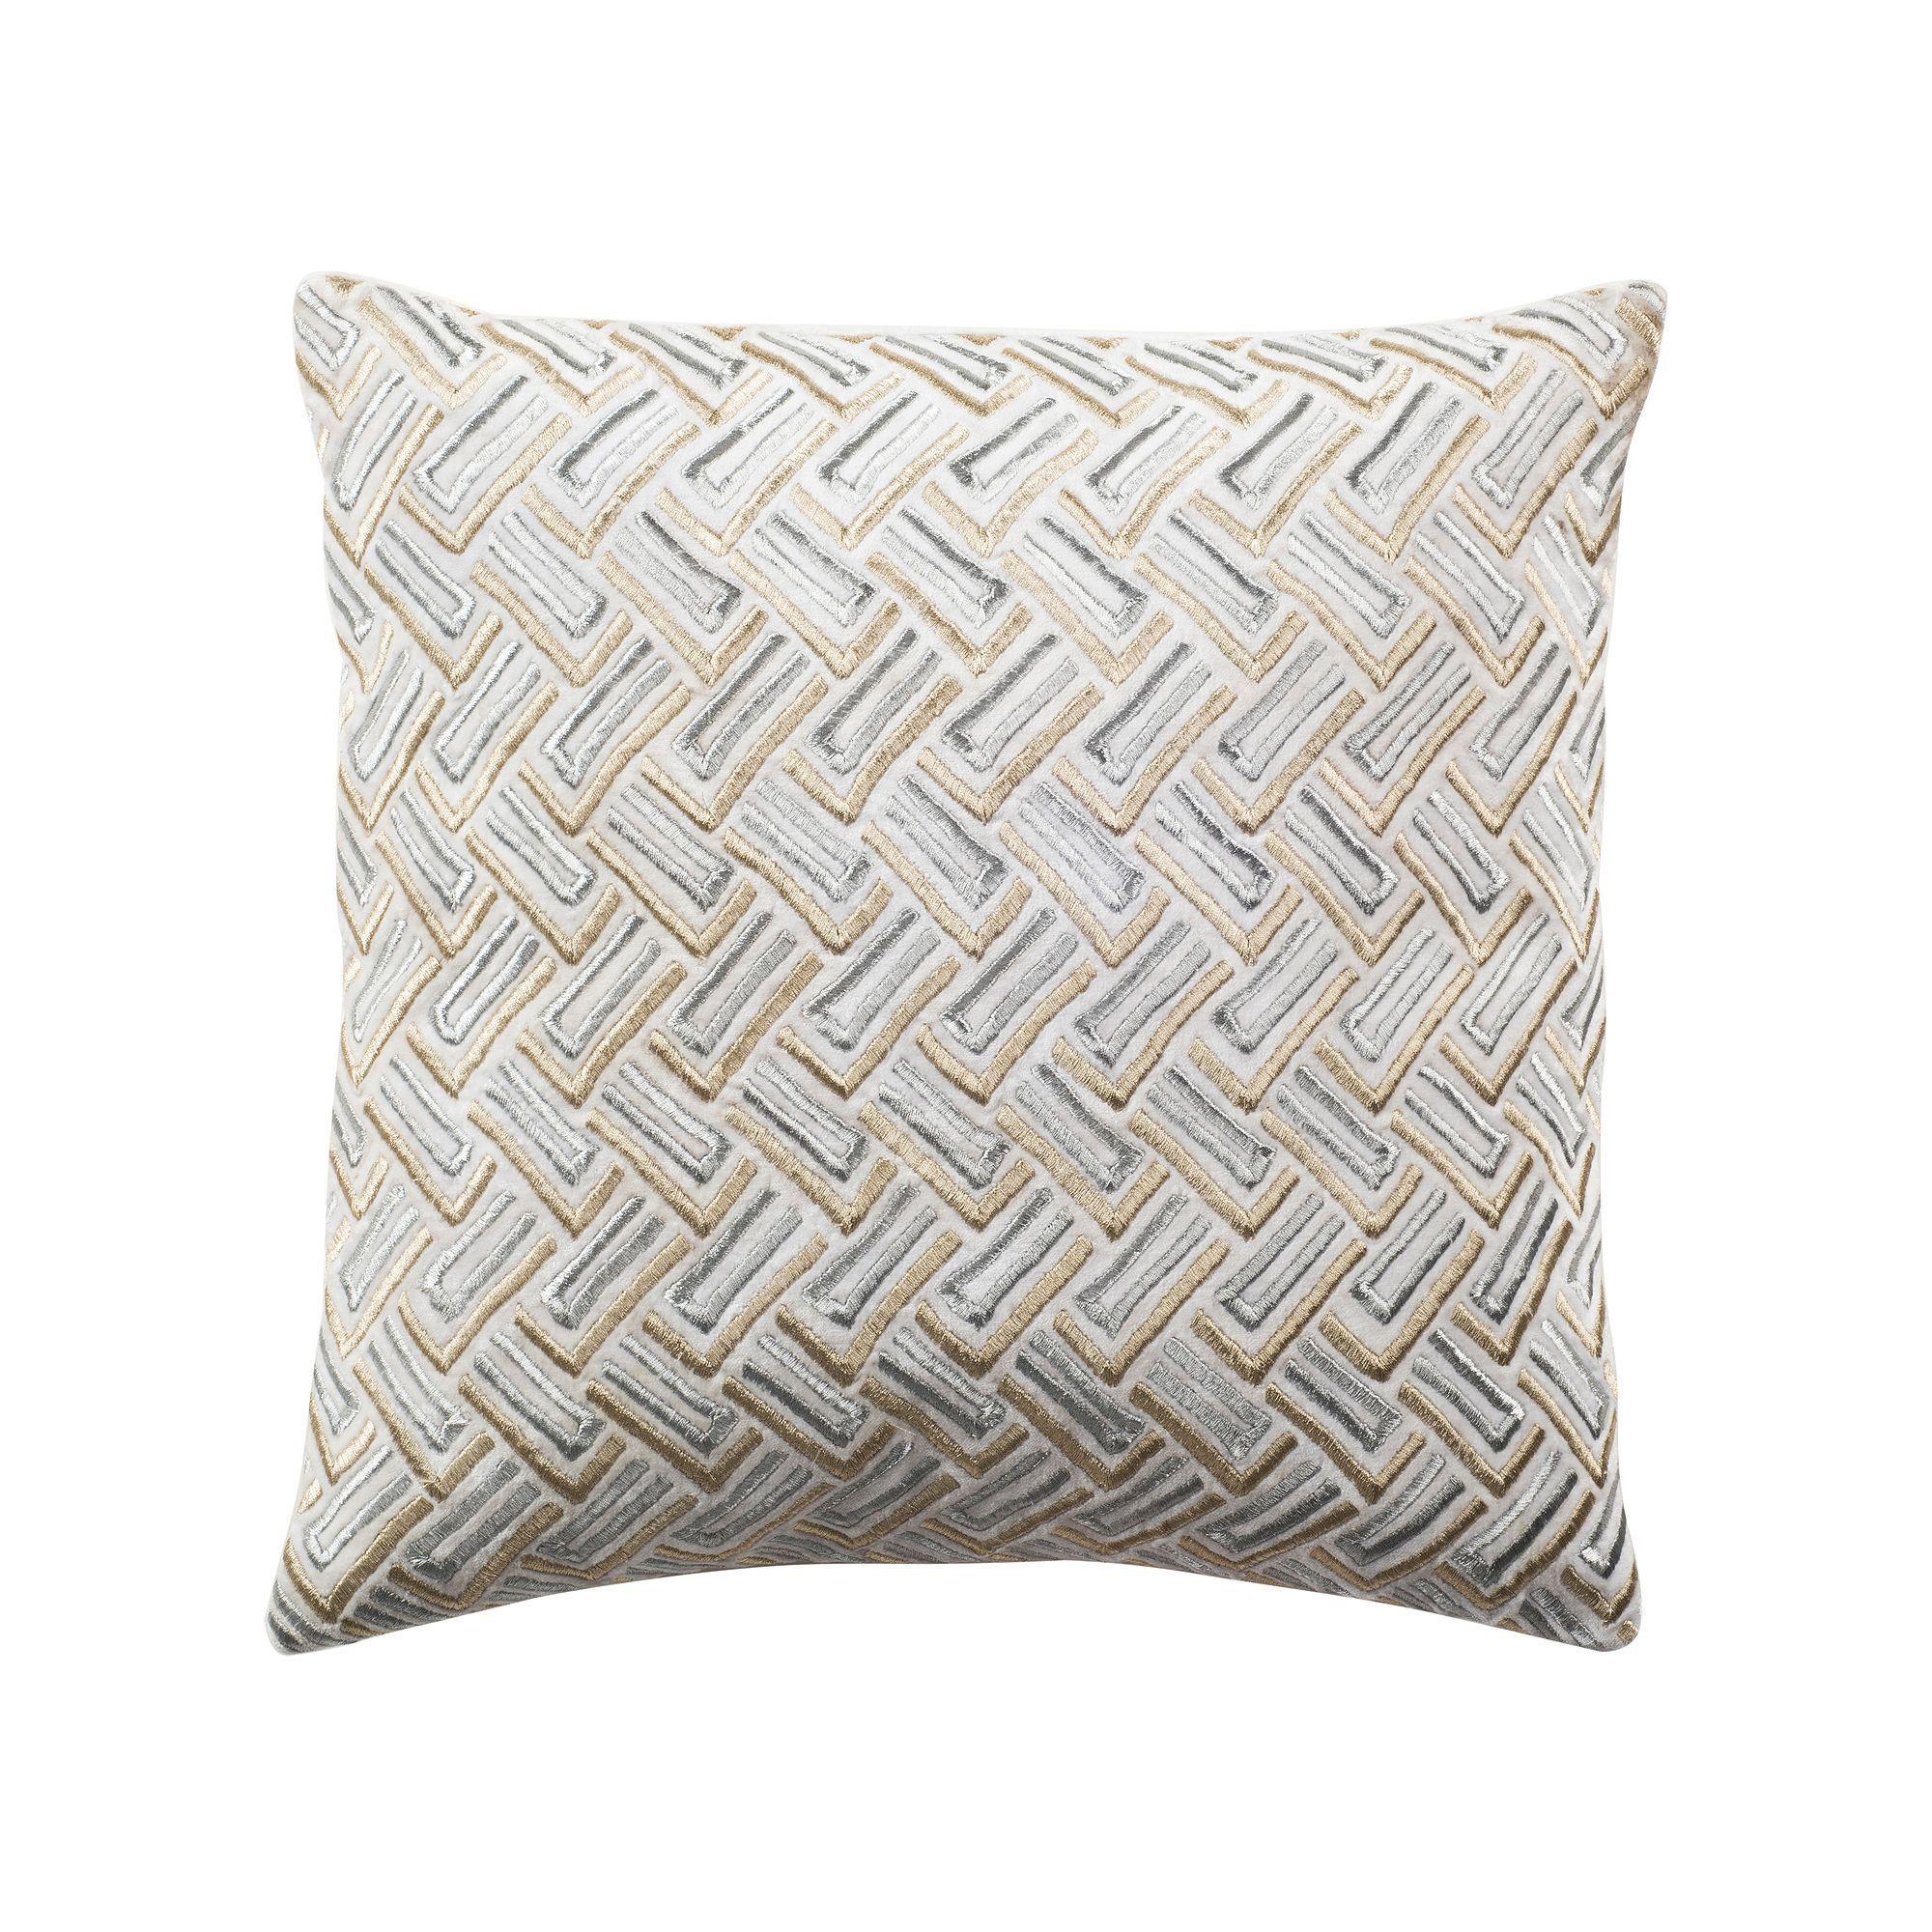 Safavieh Metallic Geometric Throw Pillow Multicolor With Images Metallic Throw Pillow Metallic Pillow Gold Decorative Pillows